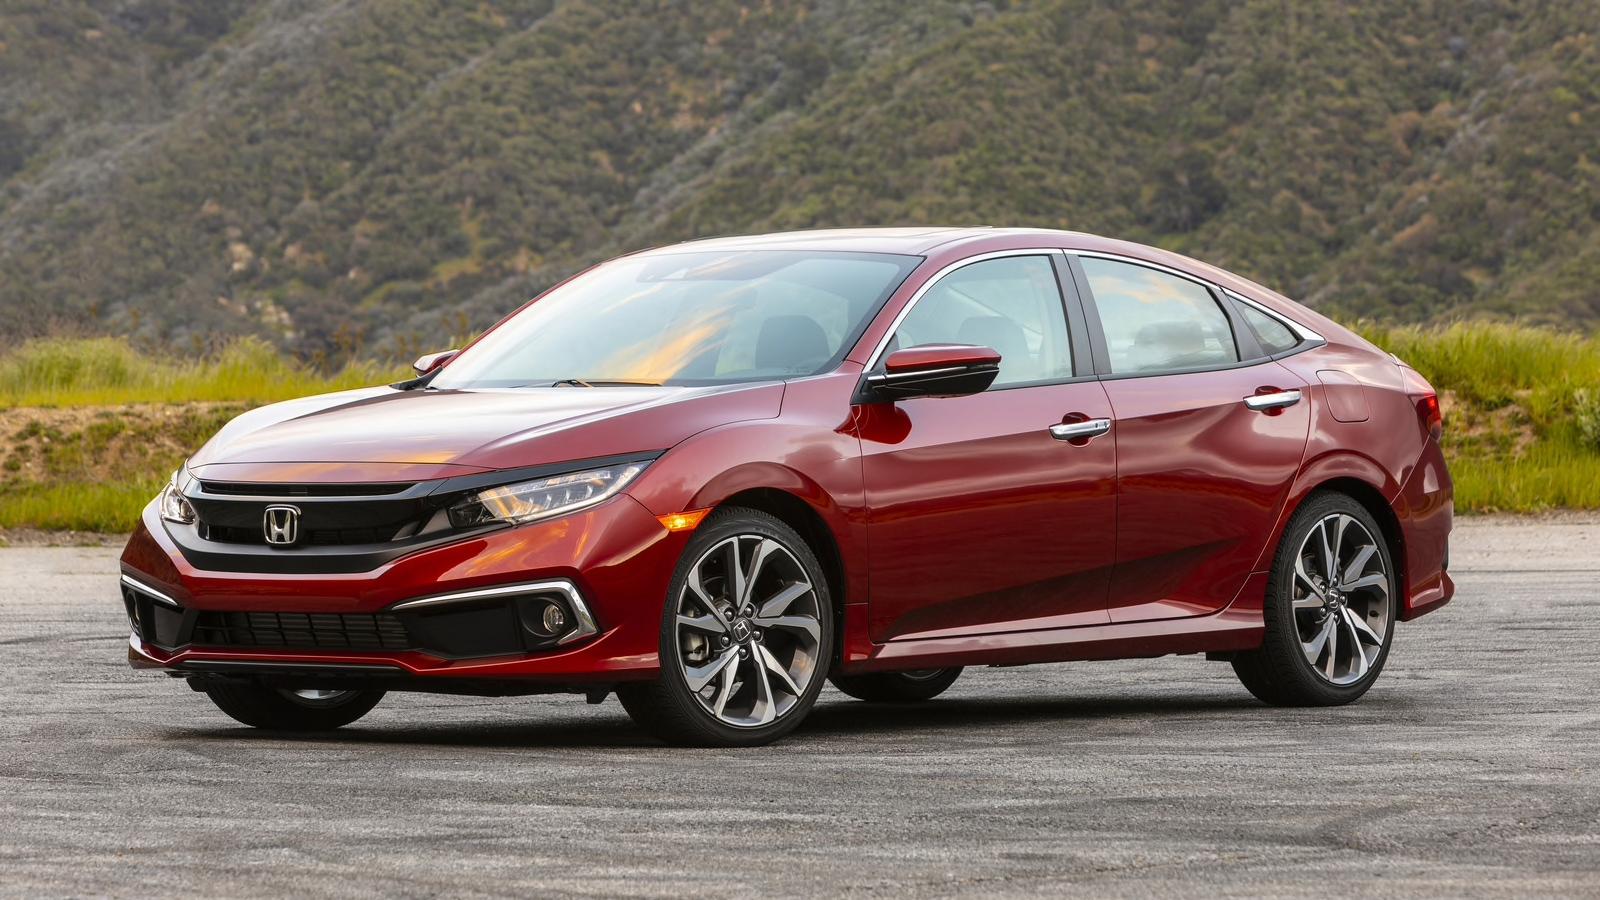 10 Best Lease Deals In April 2021 Kelley Blue Book Best Small Cars Honda Civic Honda Civic Sedan